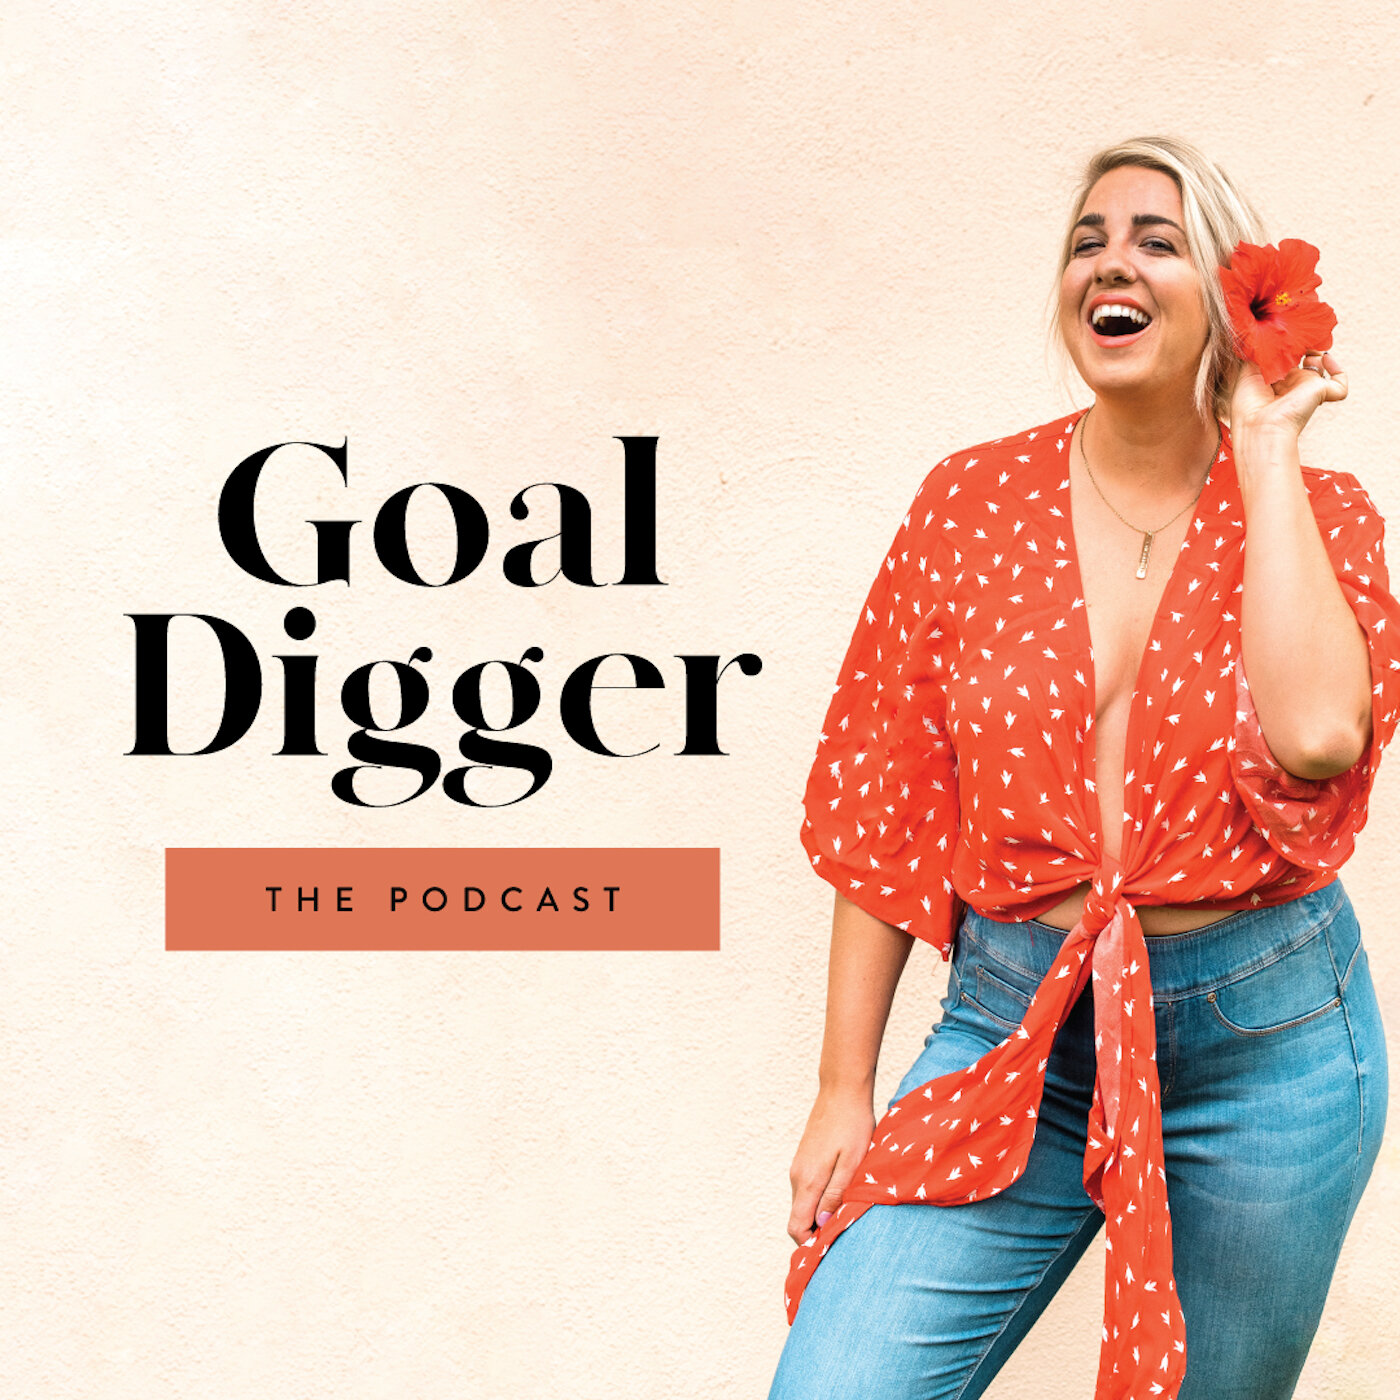 Goal Digger Podcast with Jenna Kutcher